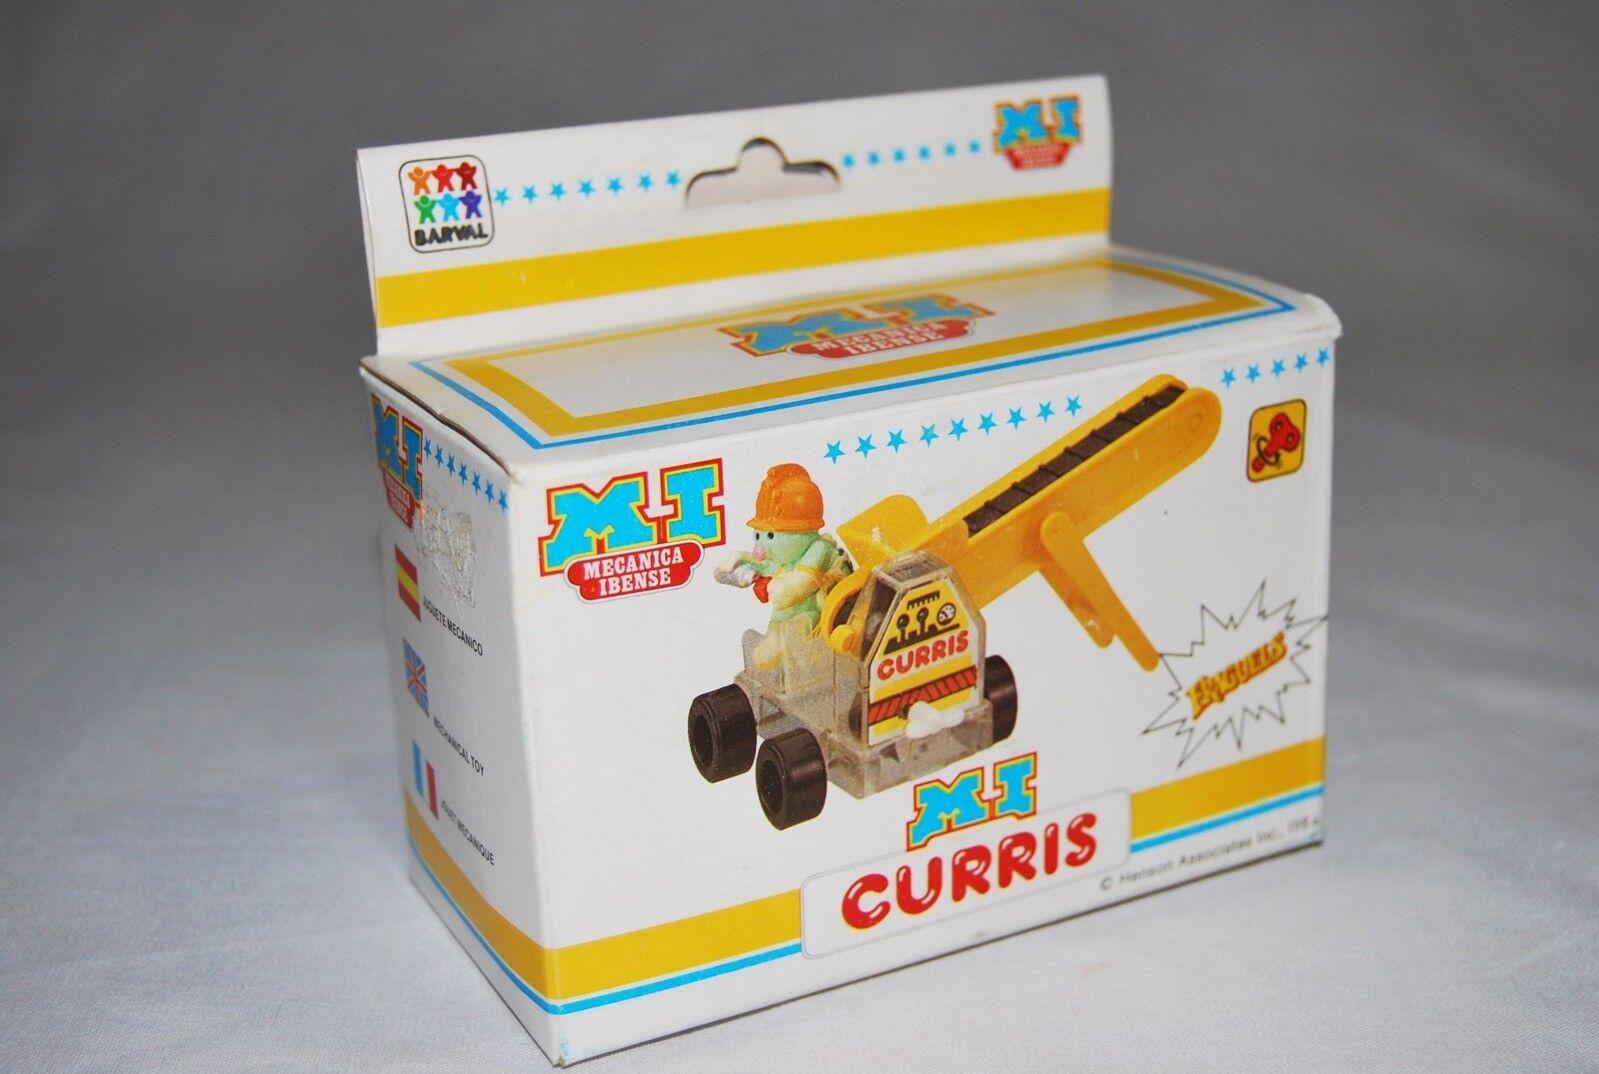 Fraggle Doozers Doozer Curris mecánico cuerda juguete 1984 Super Raro R10